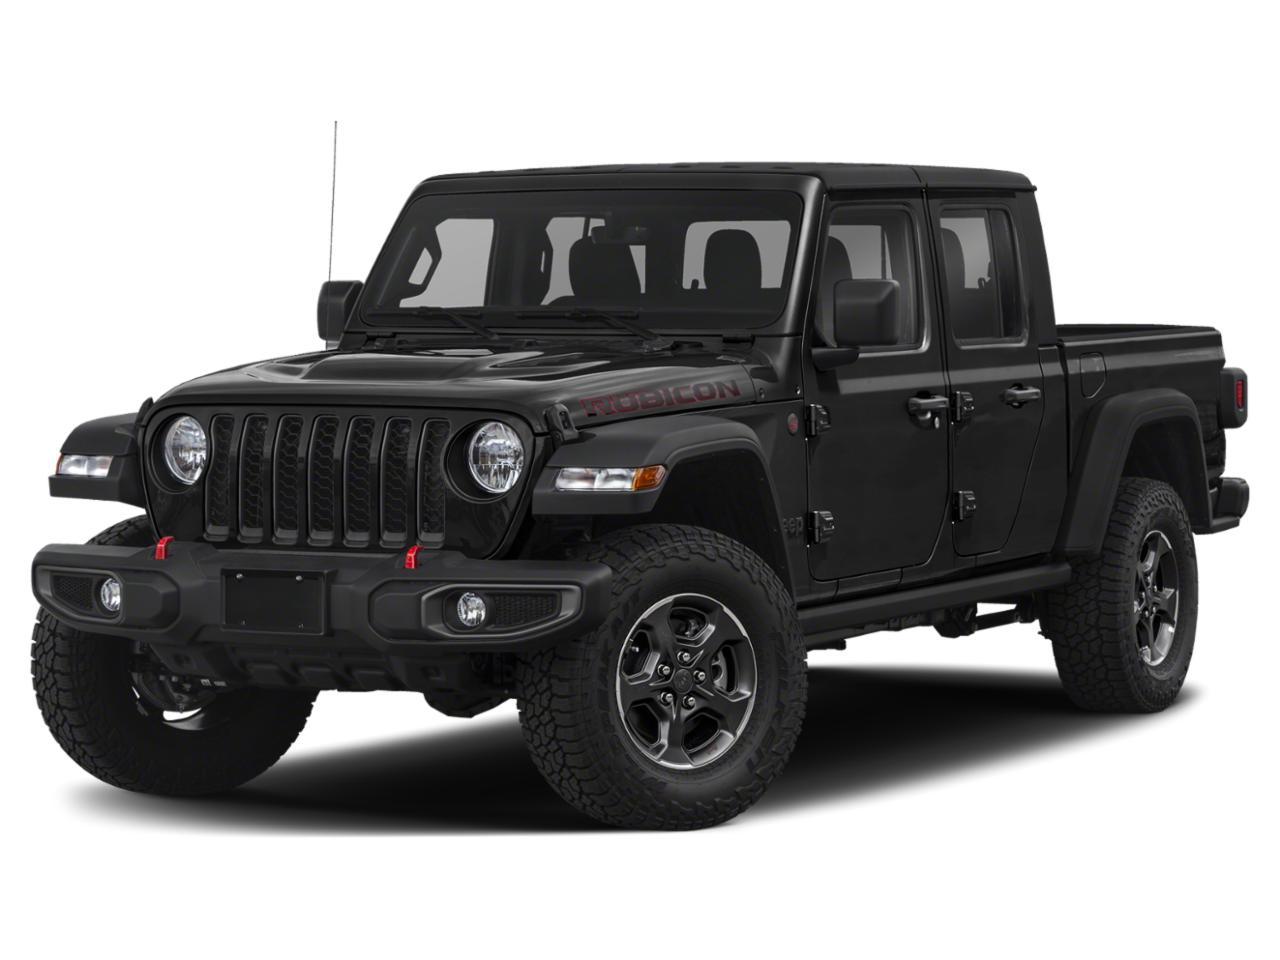 2020 Jeep Gladiator Vehicle Photo in Houston, TX 77054